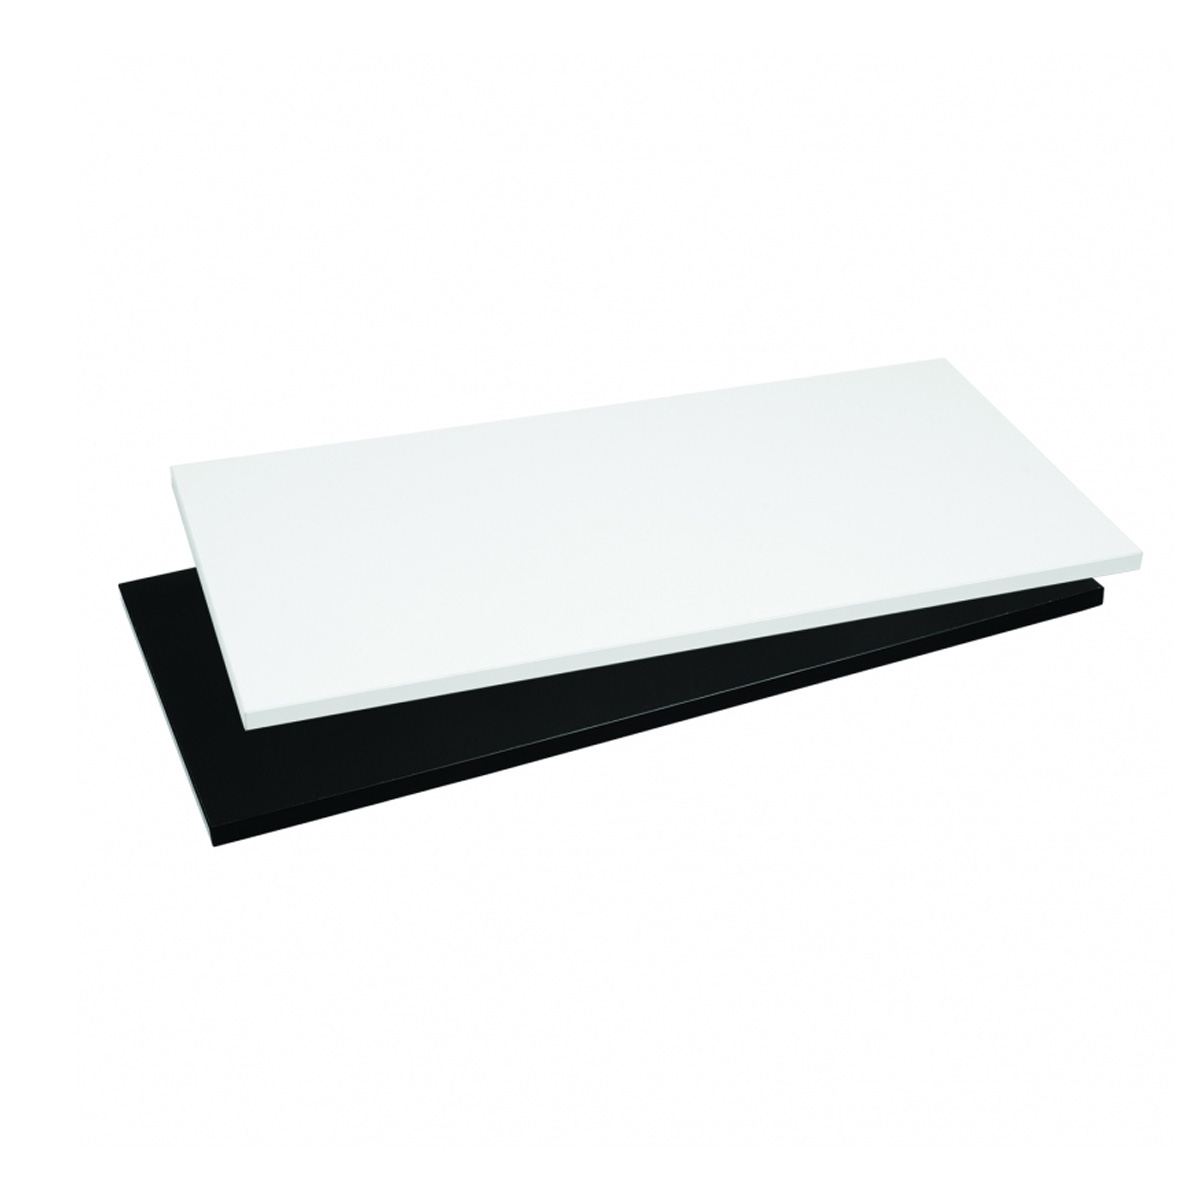 Holzfachboden Wandmodul breit schwarz